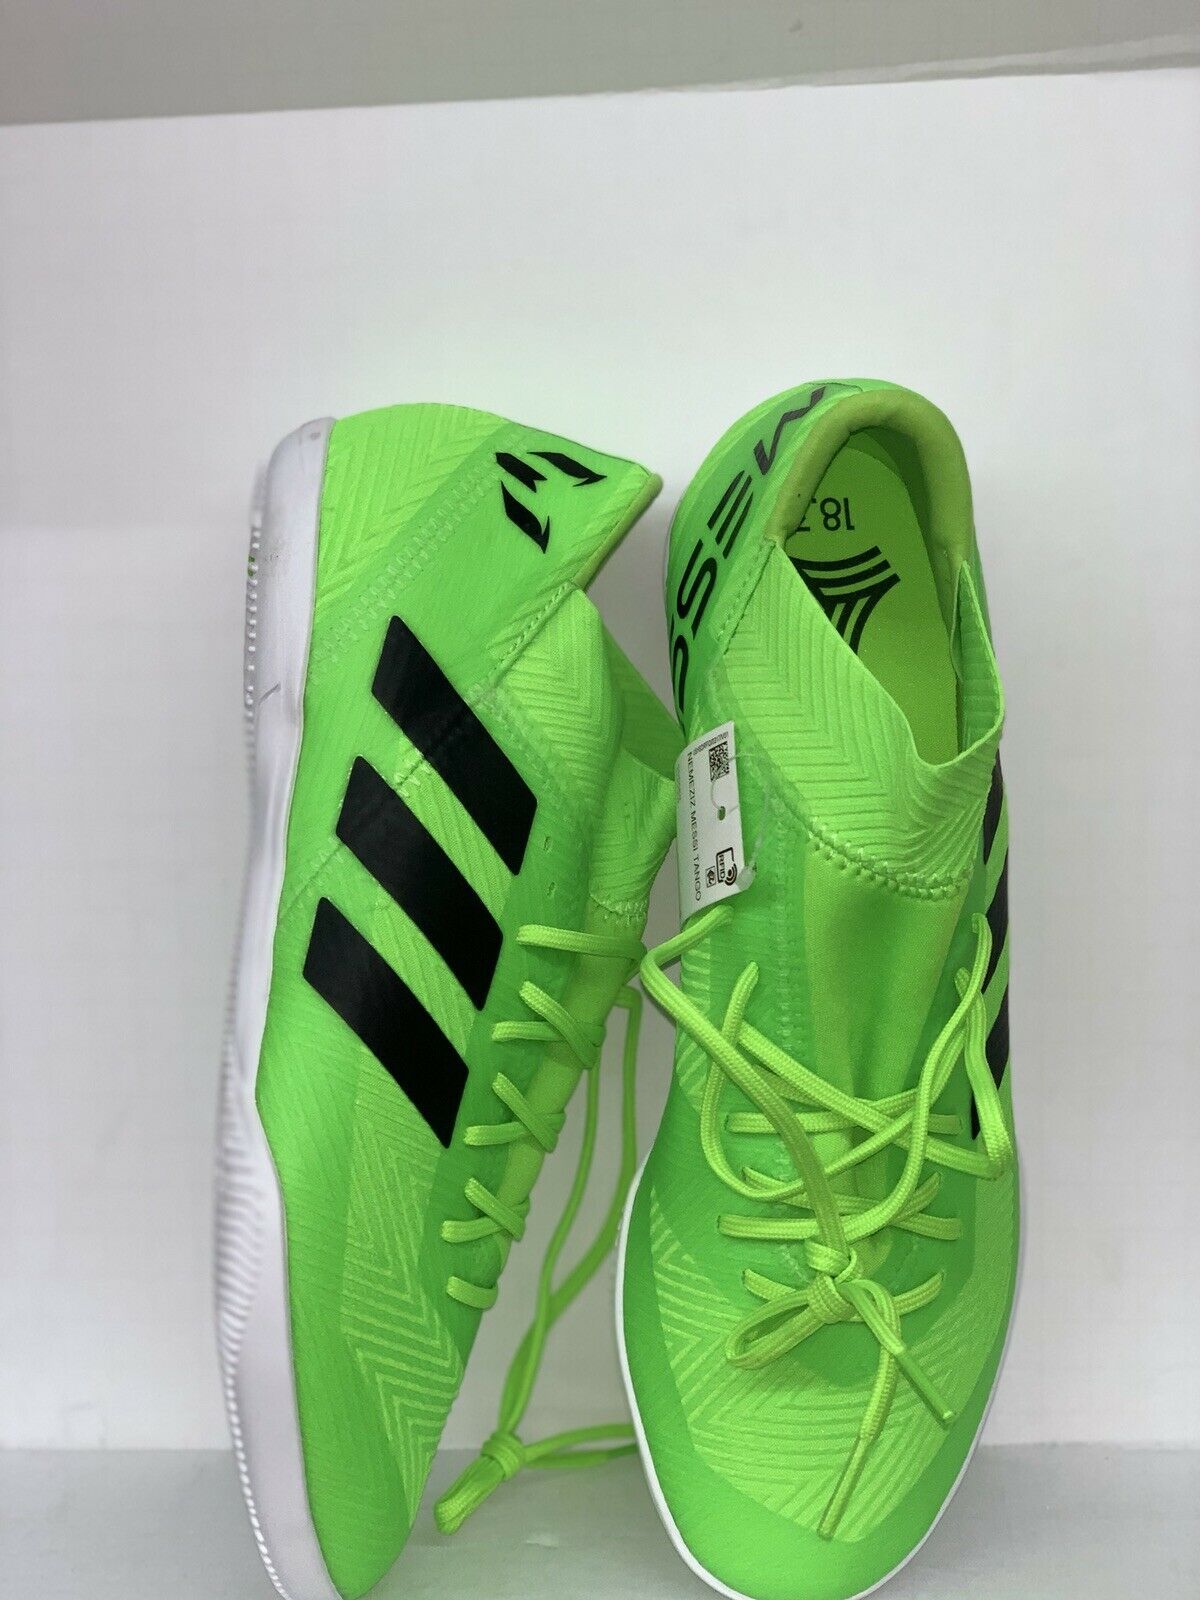 Adidas Nemeziz Messi Tango 18.3 Indoor Soccer shoes AQ0618 New Size 9.5